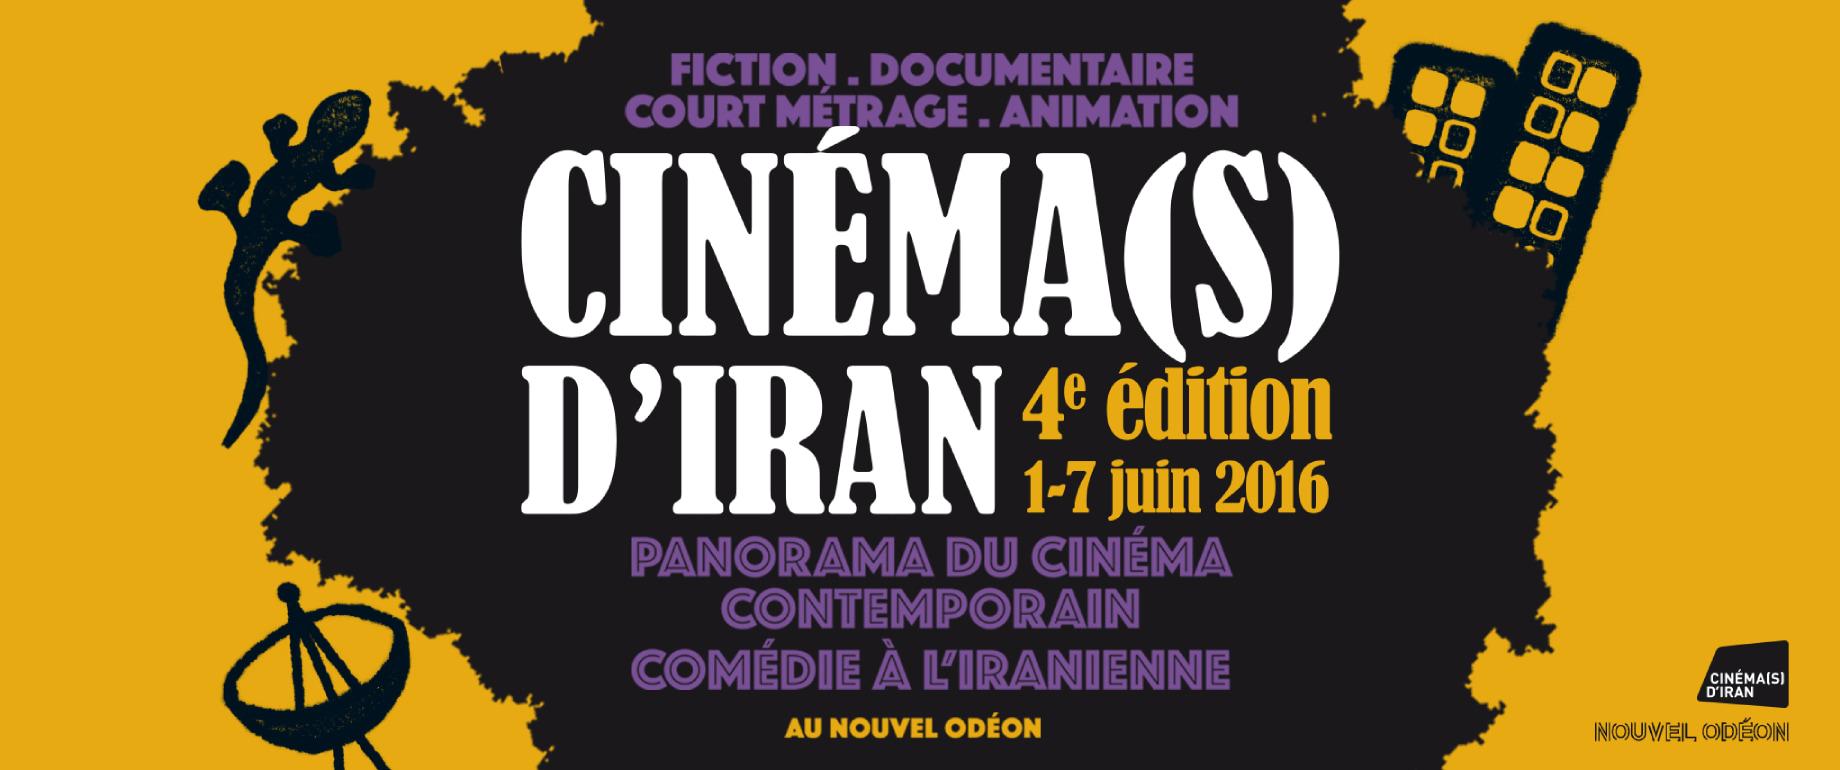 Festival Cinéma(s) d'Iran #4